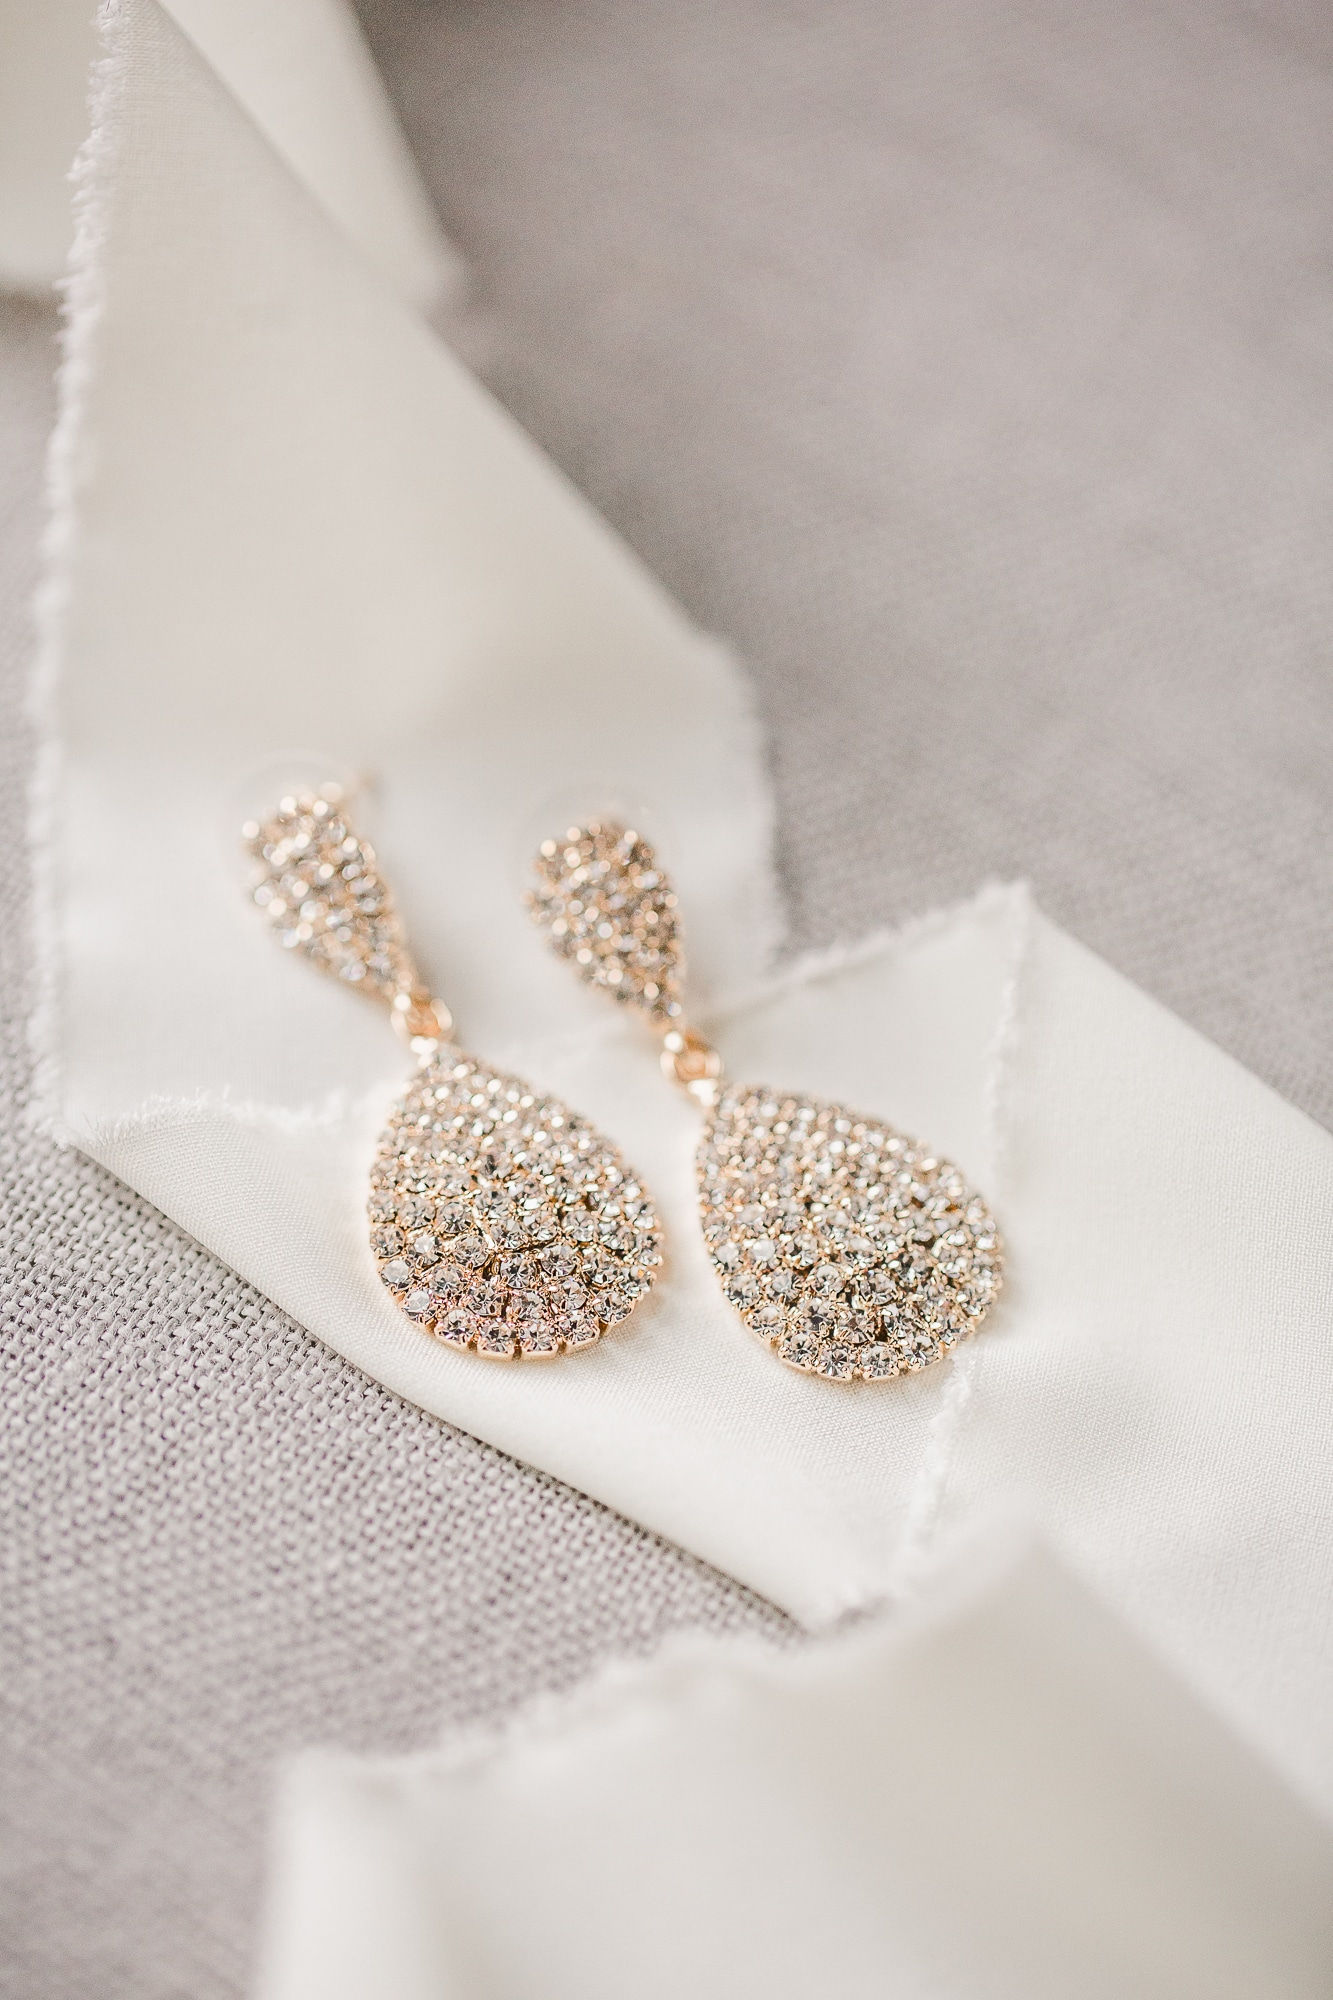 Dangling Bridal Earrings | Nashville Bride Guide